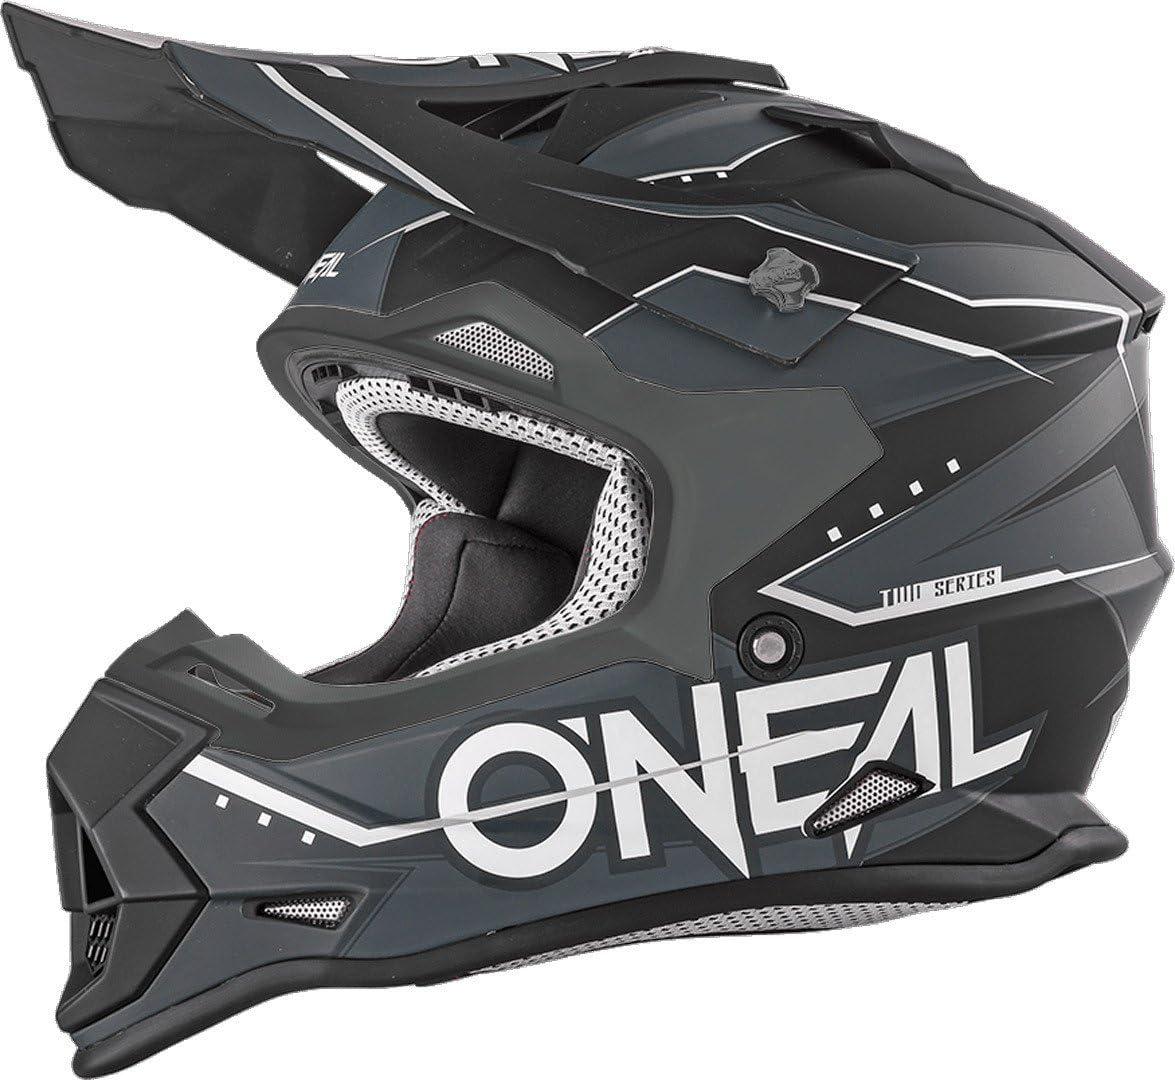 O Neal 2 Series Slingshot Youth Kinder Motocross Enduro Mtb Helm Blau Schwarz Weiß 2018 Oneal Größe S 49 50 Cm Auto